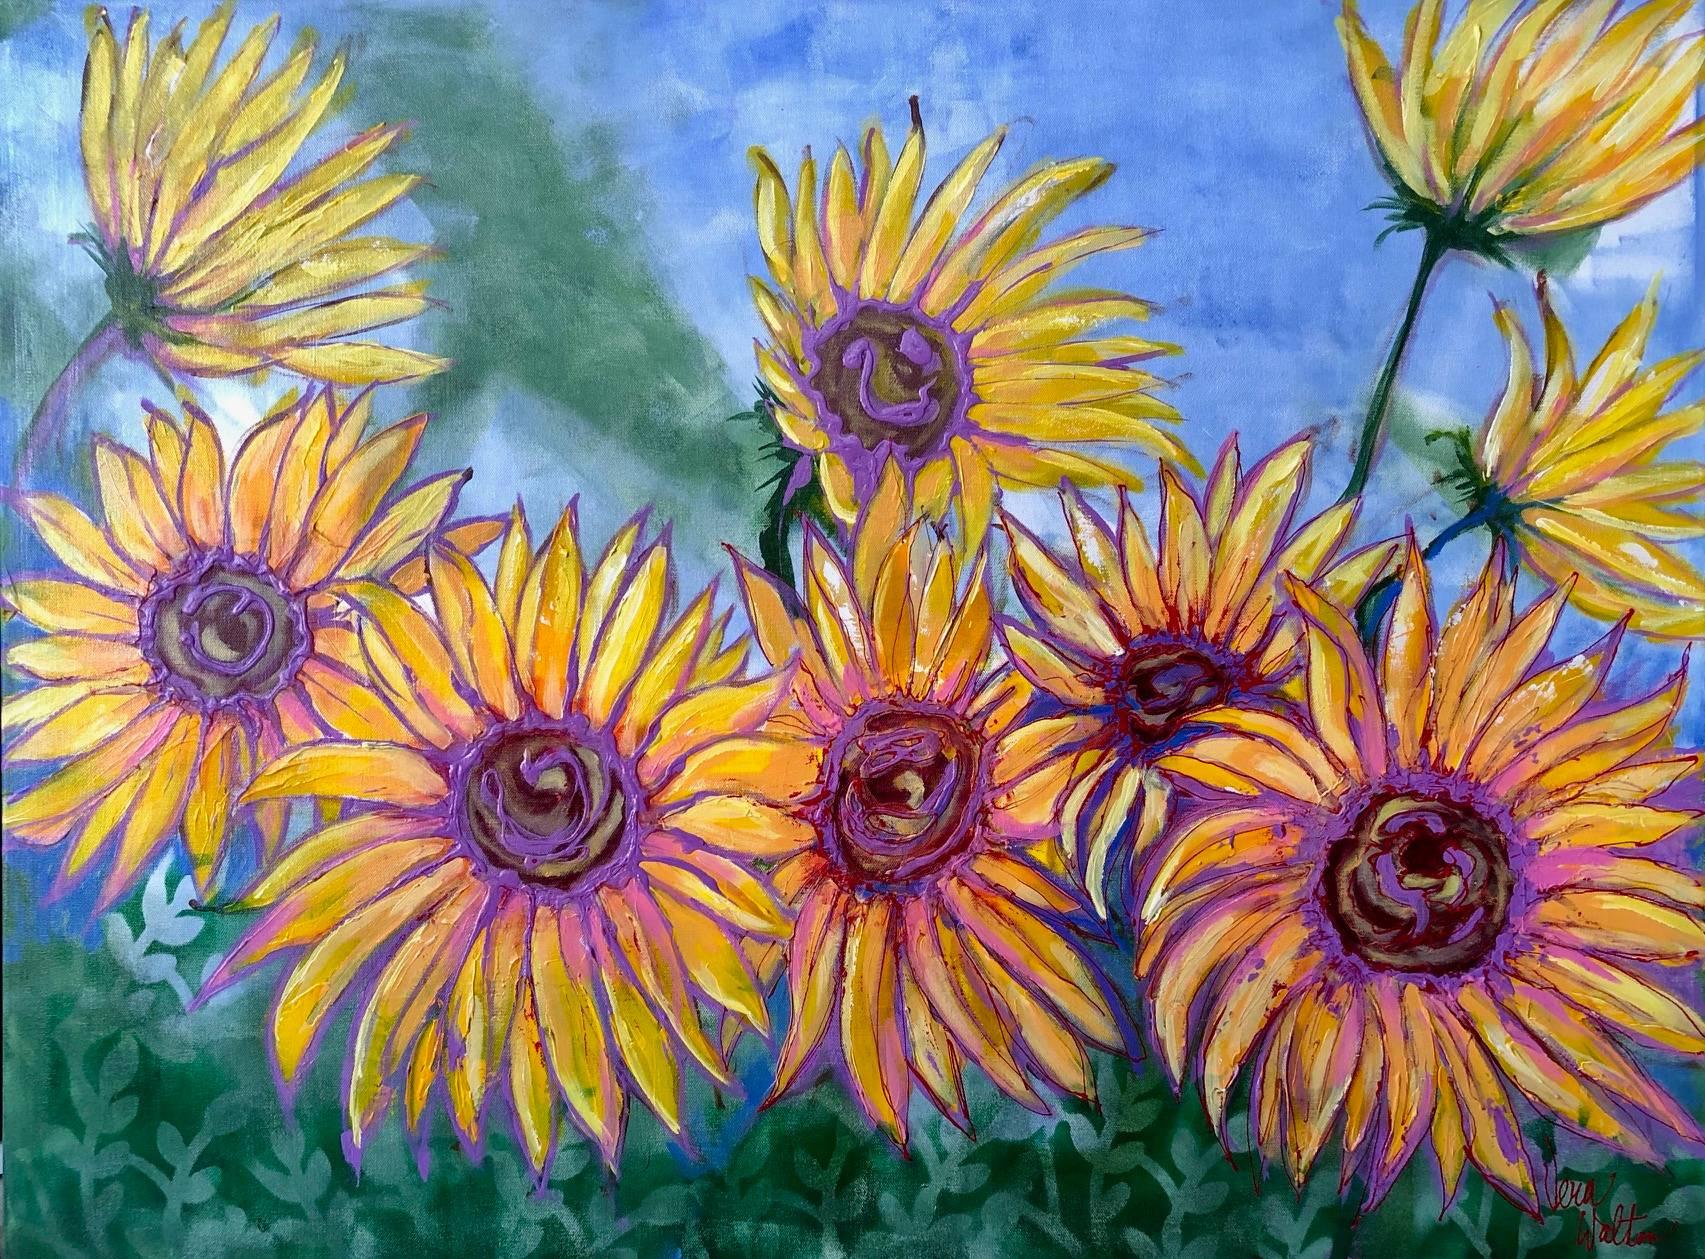 Sunflower Feast